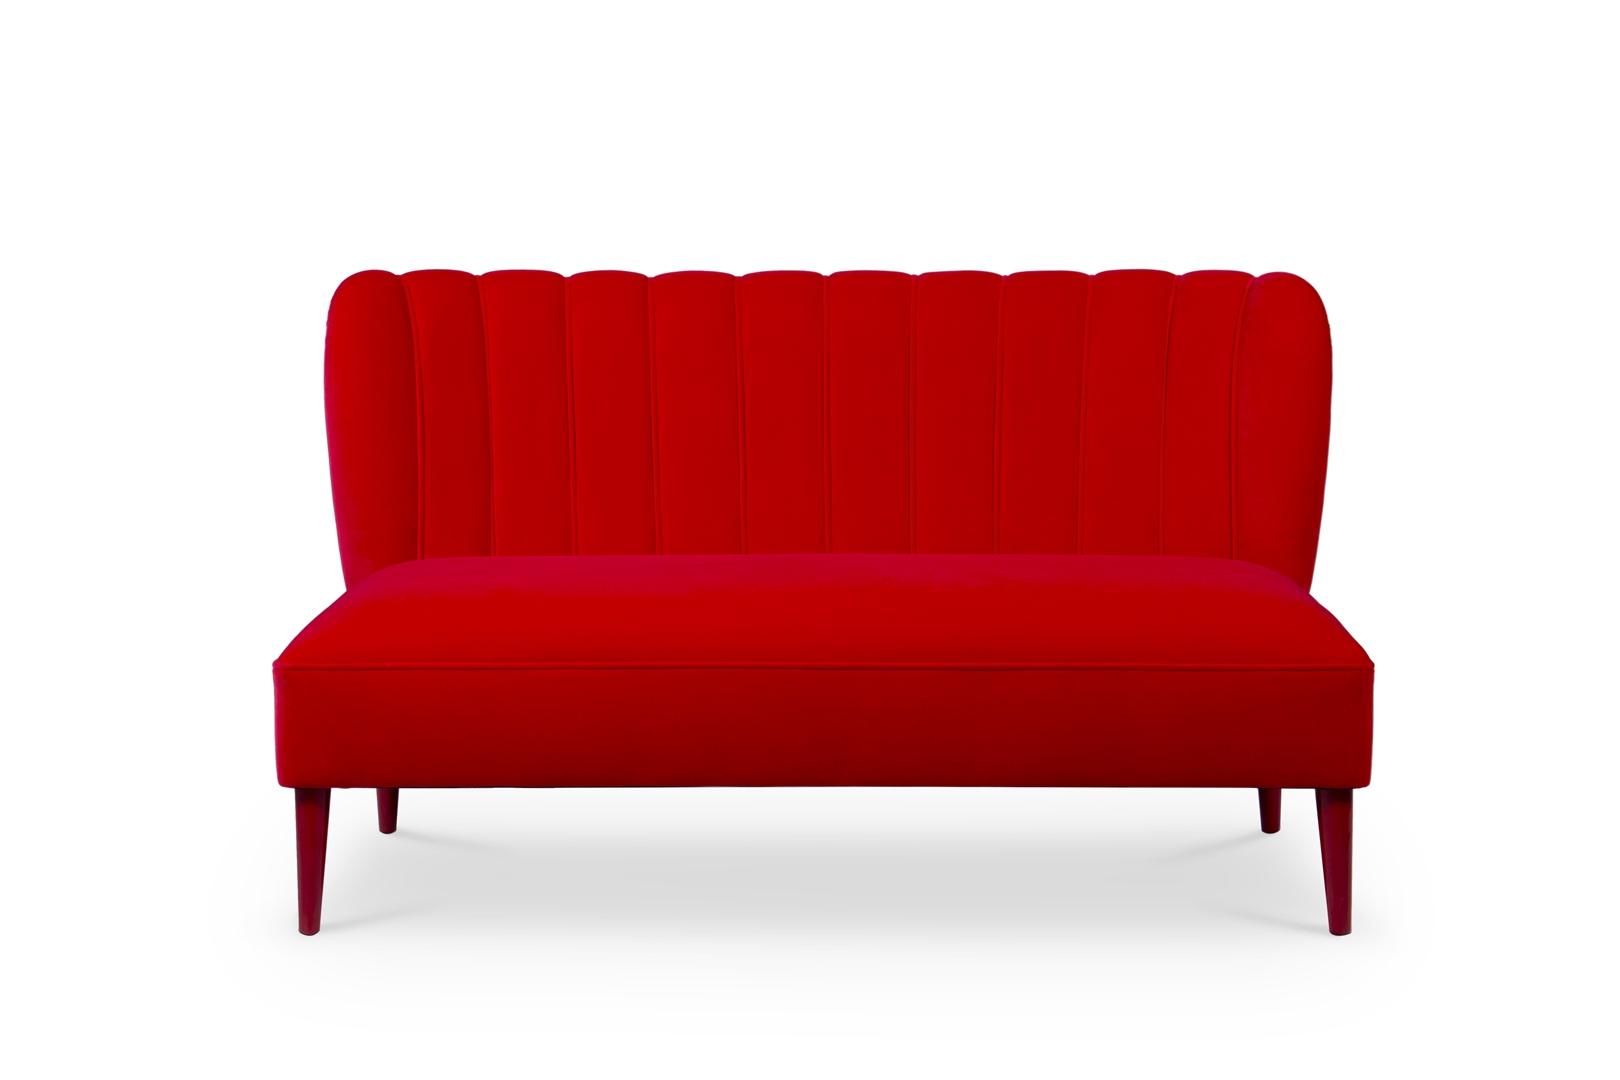 dalyan-2-seat-sofa-4-HR (Copy)